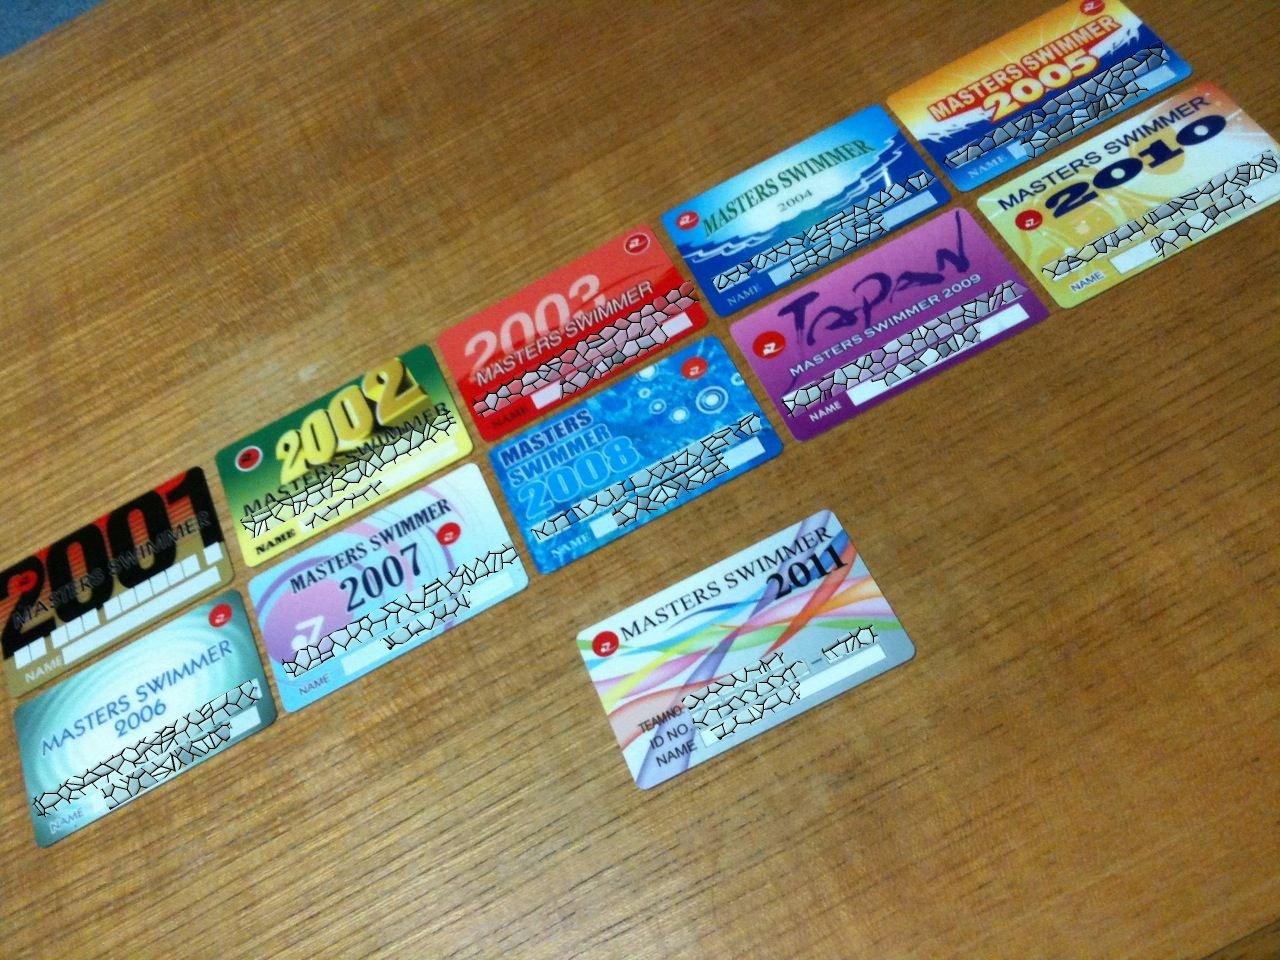 20110211_masters-card_02.jpg